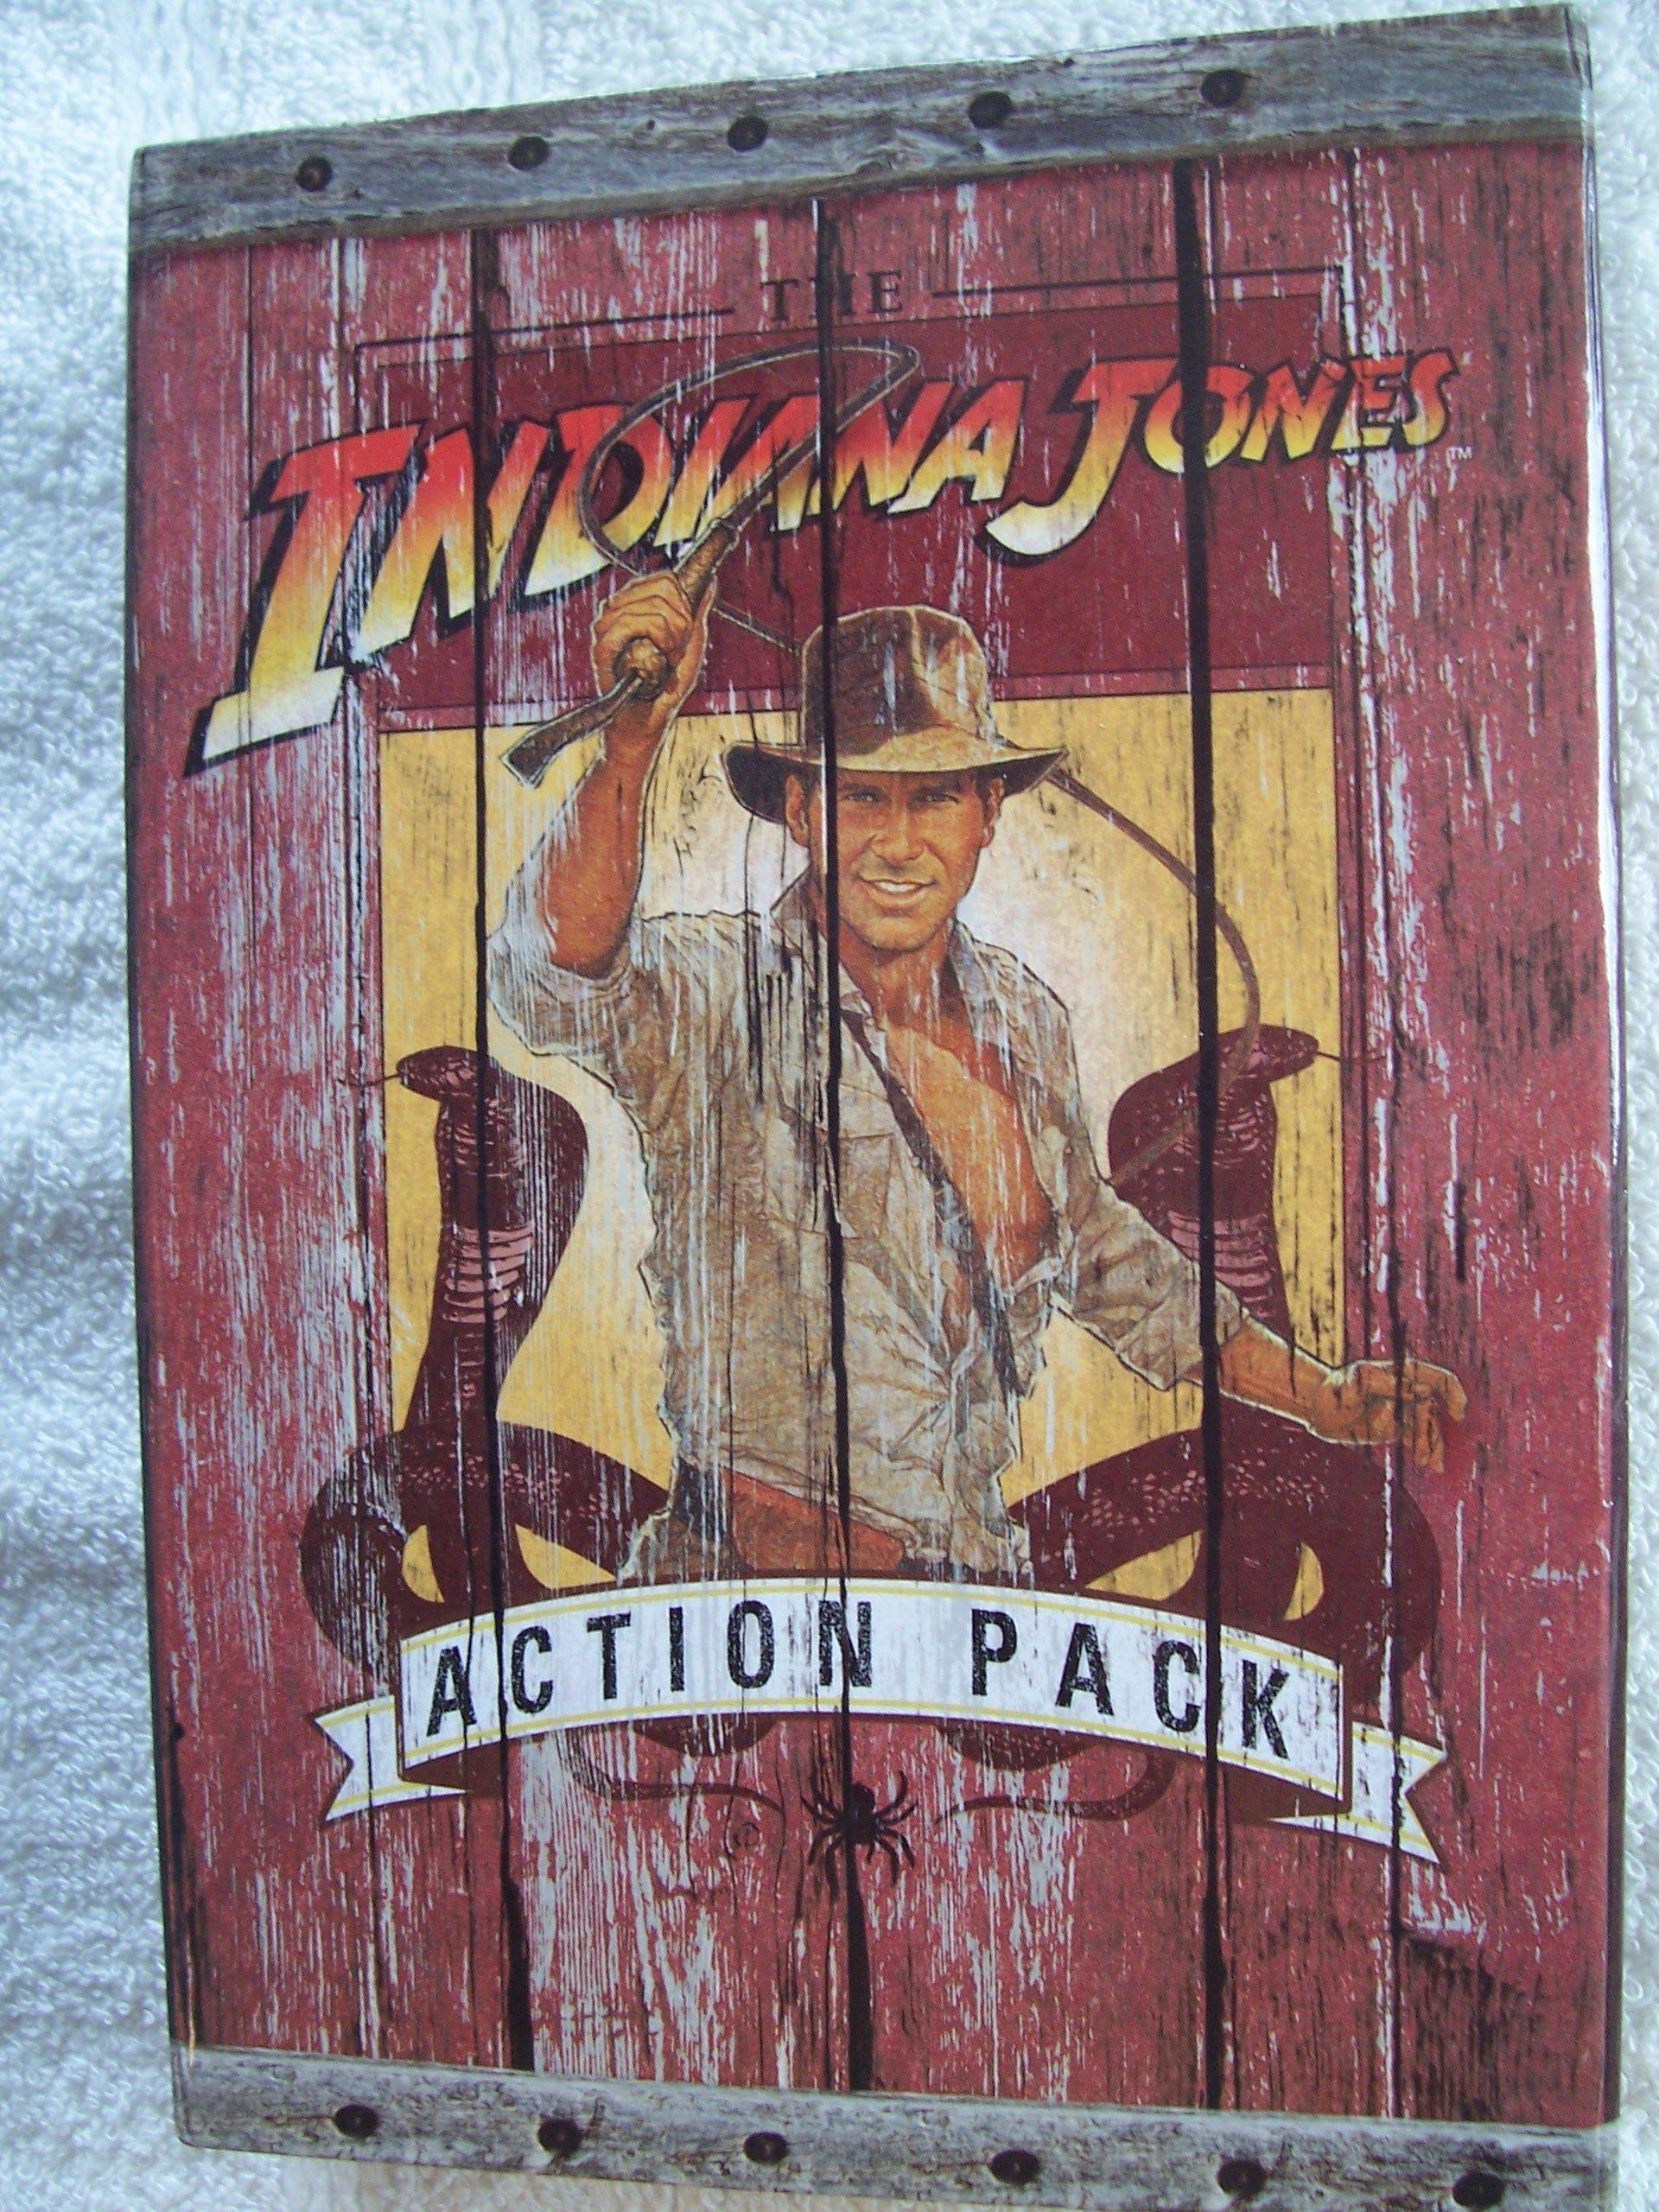 Indiana Jones Action Pack 3 Book Set plus Bonus Poster - Indiana Jones and the Pyramid of the Sorcerer, Indiana Jones and the Mystery of Mount Sinai, The Indiana Jones Handbook: The